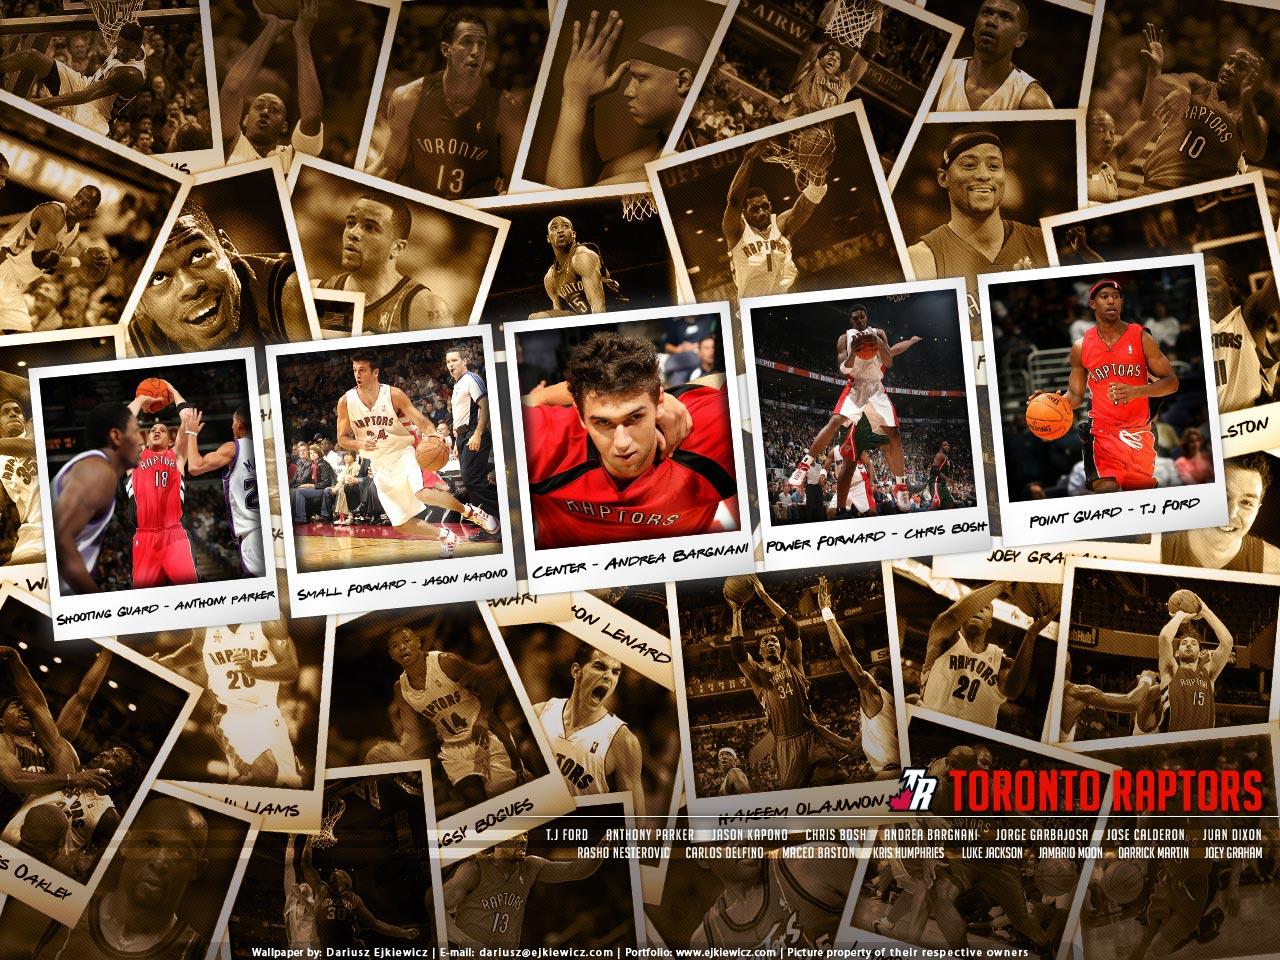 Toronto Raptors Polaroid Wallpaper Basketball Wallpapers at 1280x960